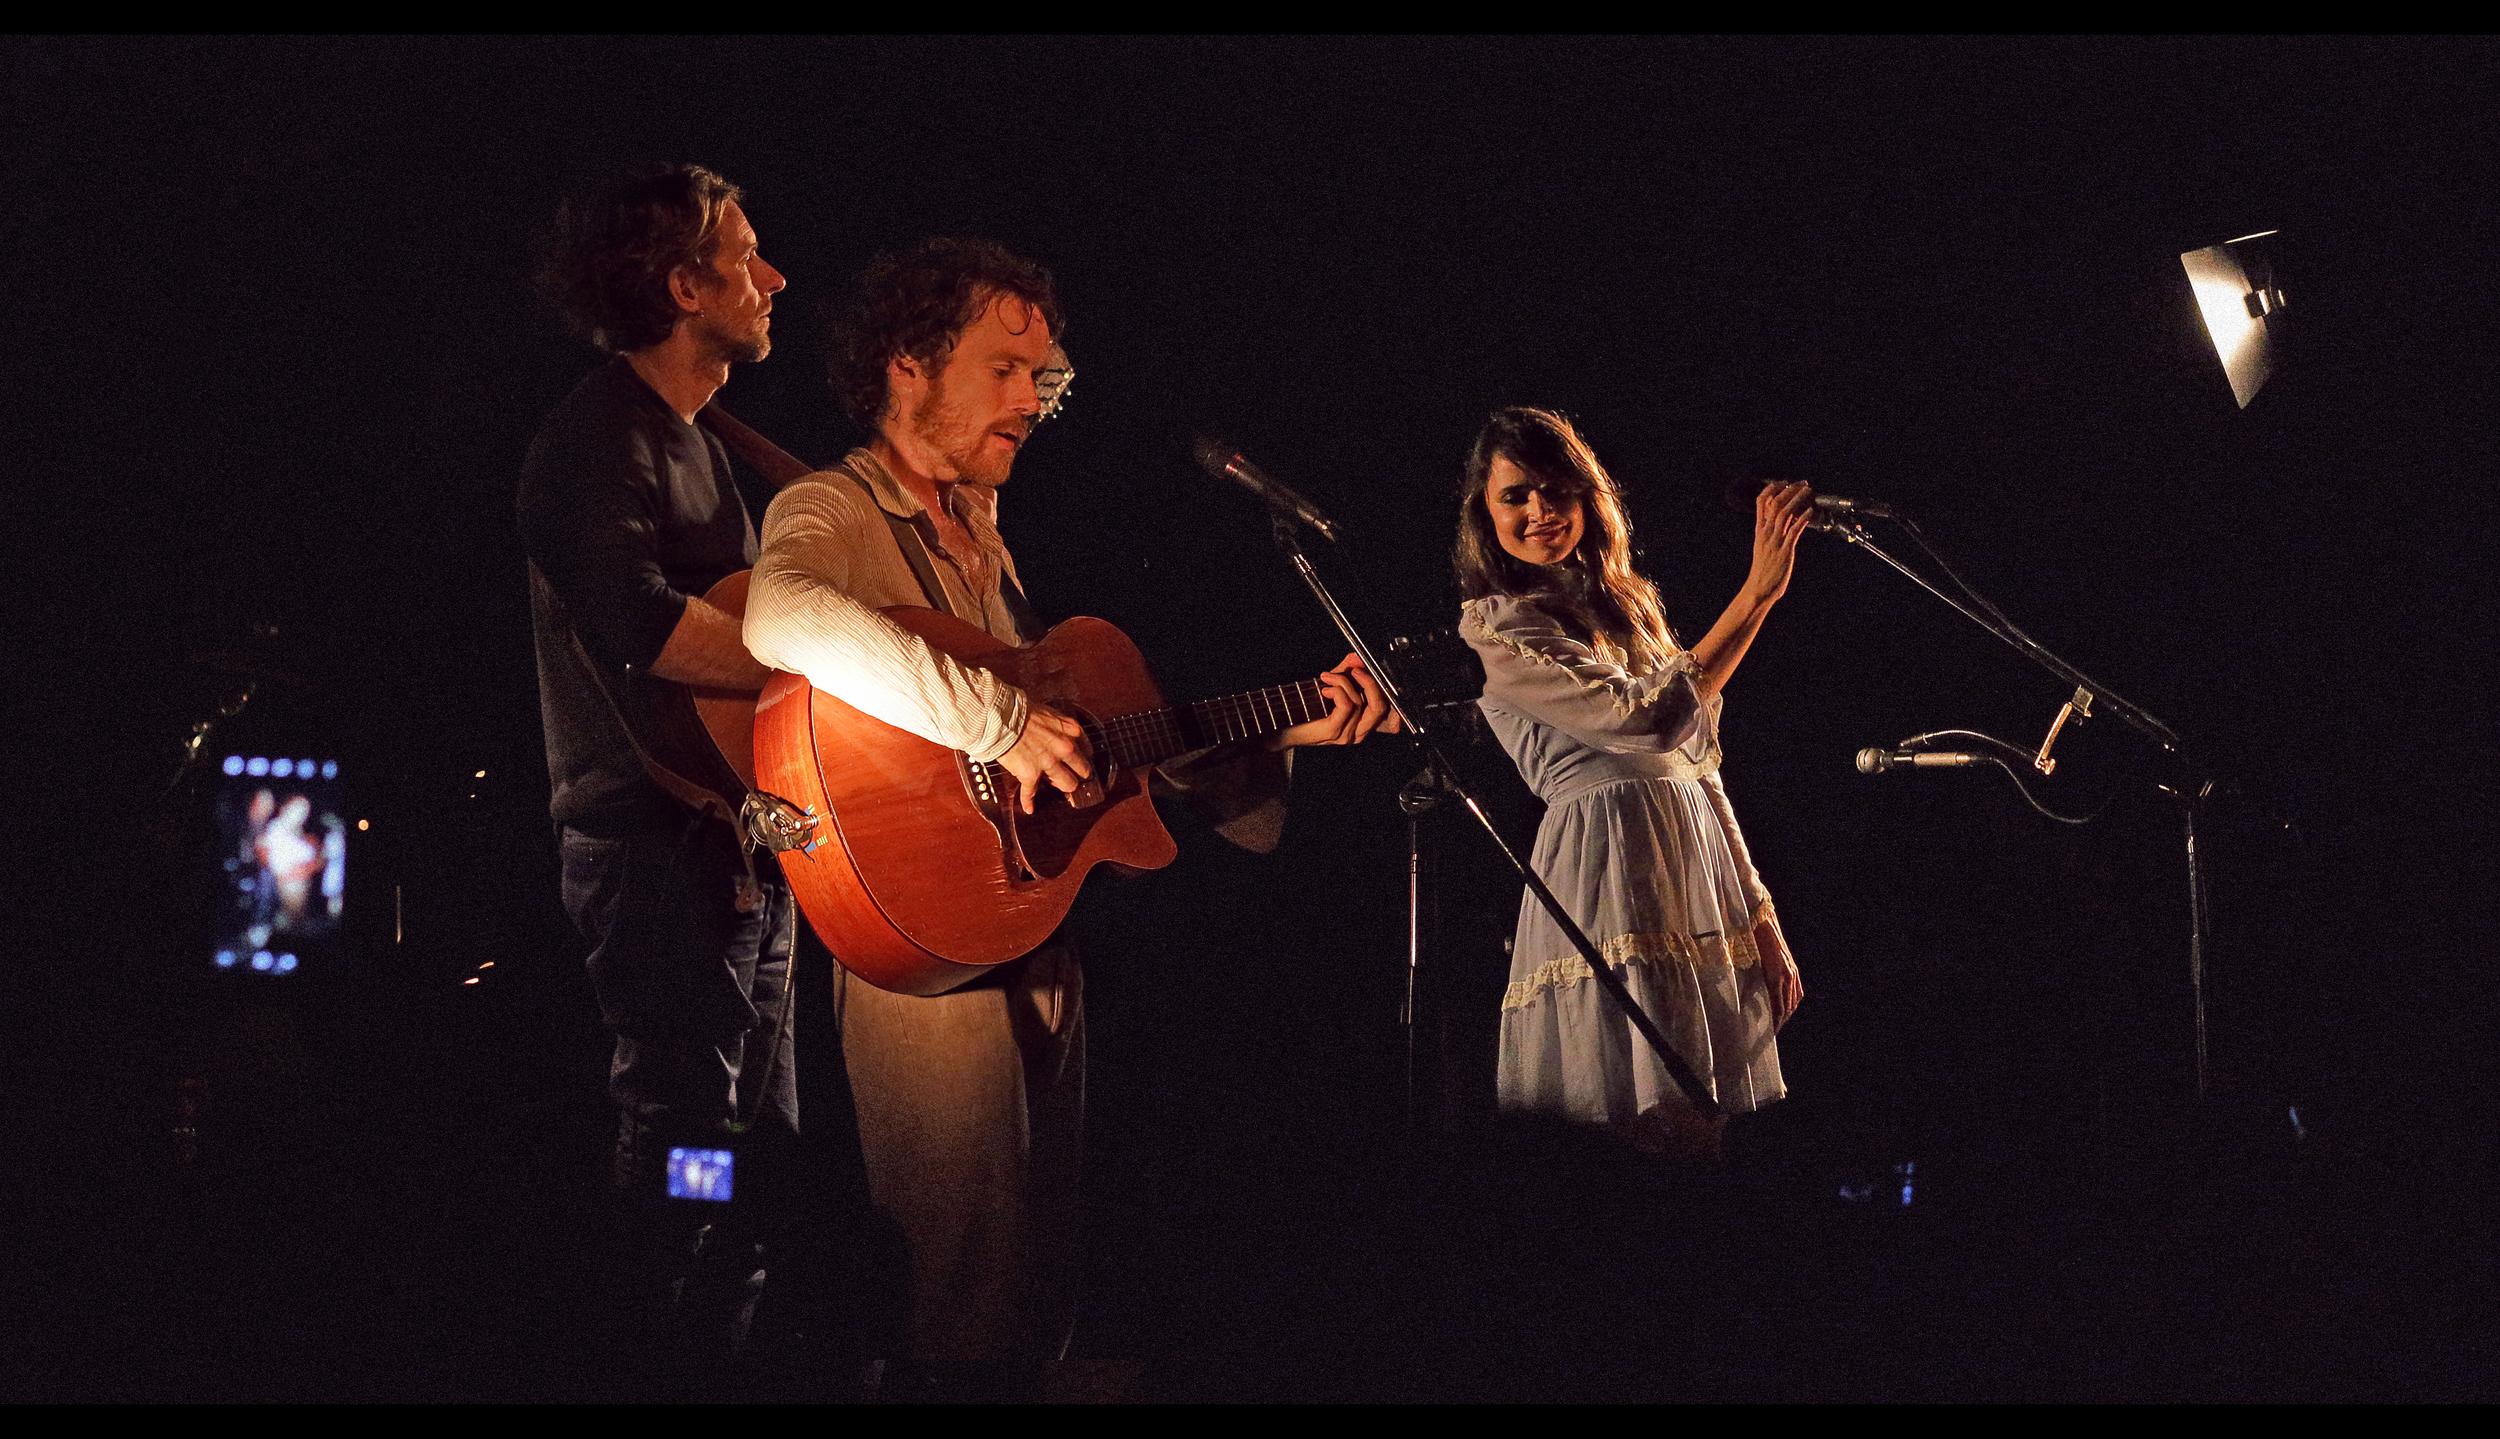 Damien Rice, Joel Shearer and Mia Maestro by Smerdiakov